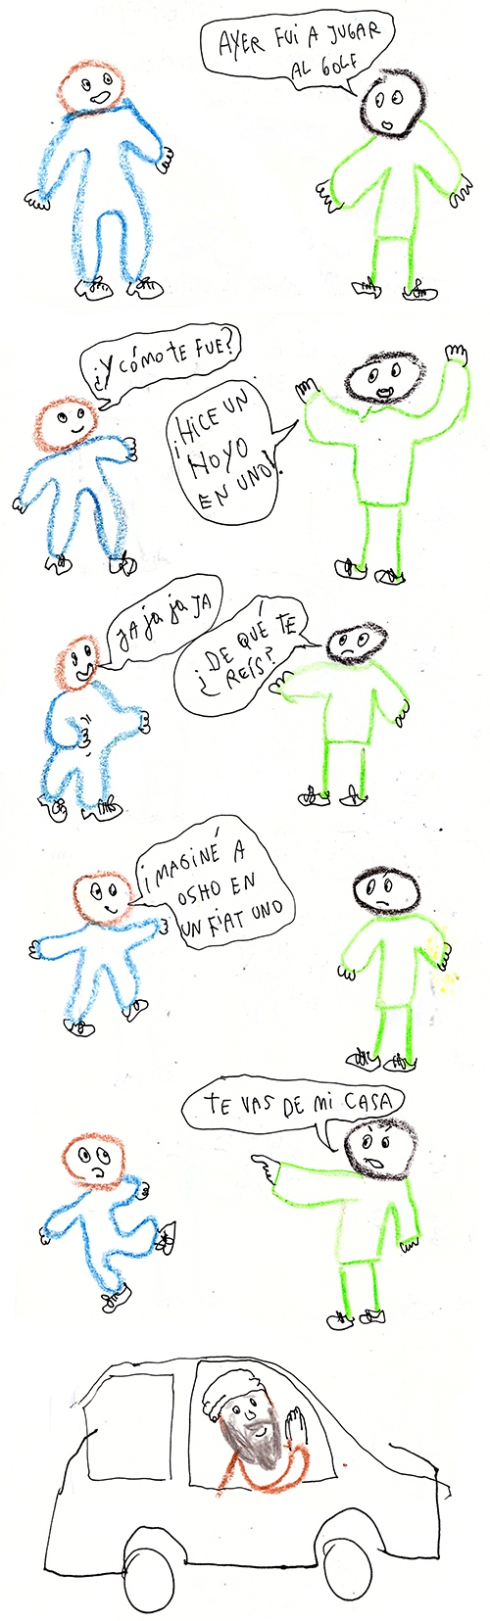 osho en uno_vertical_b